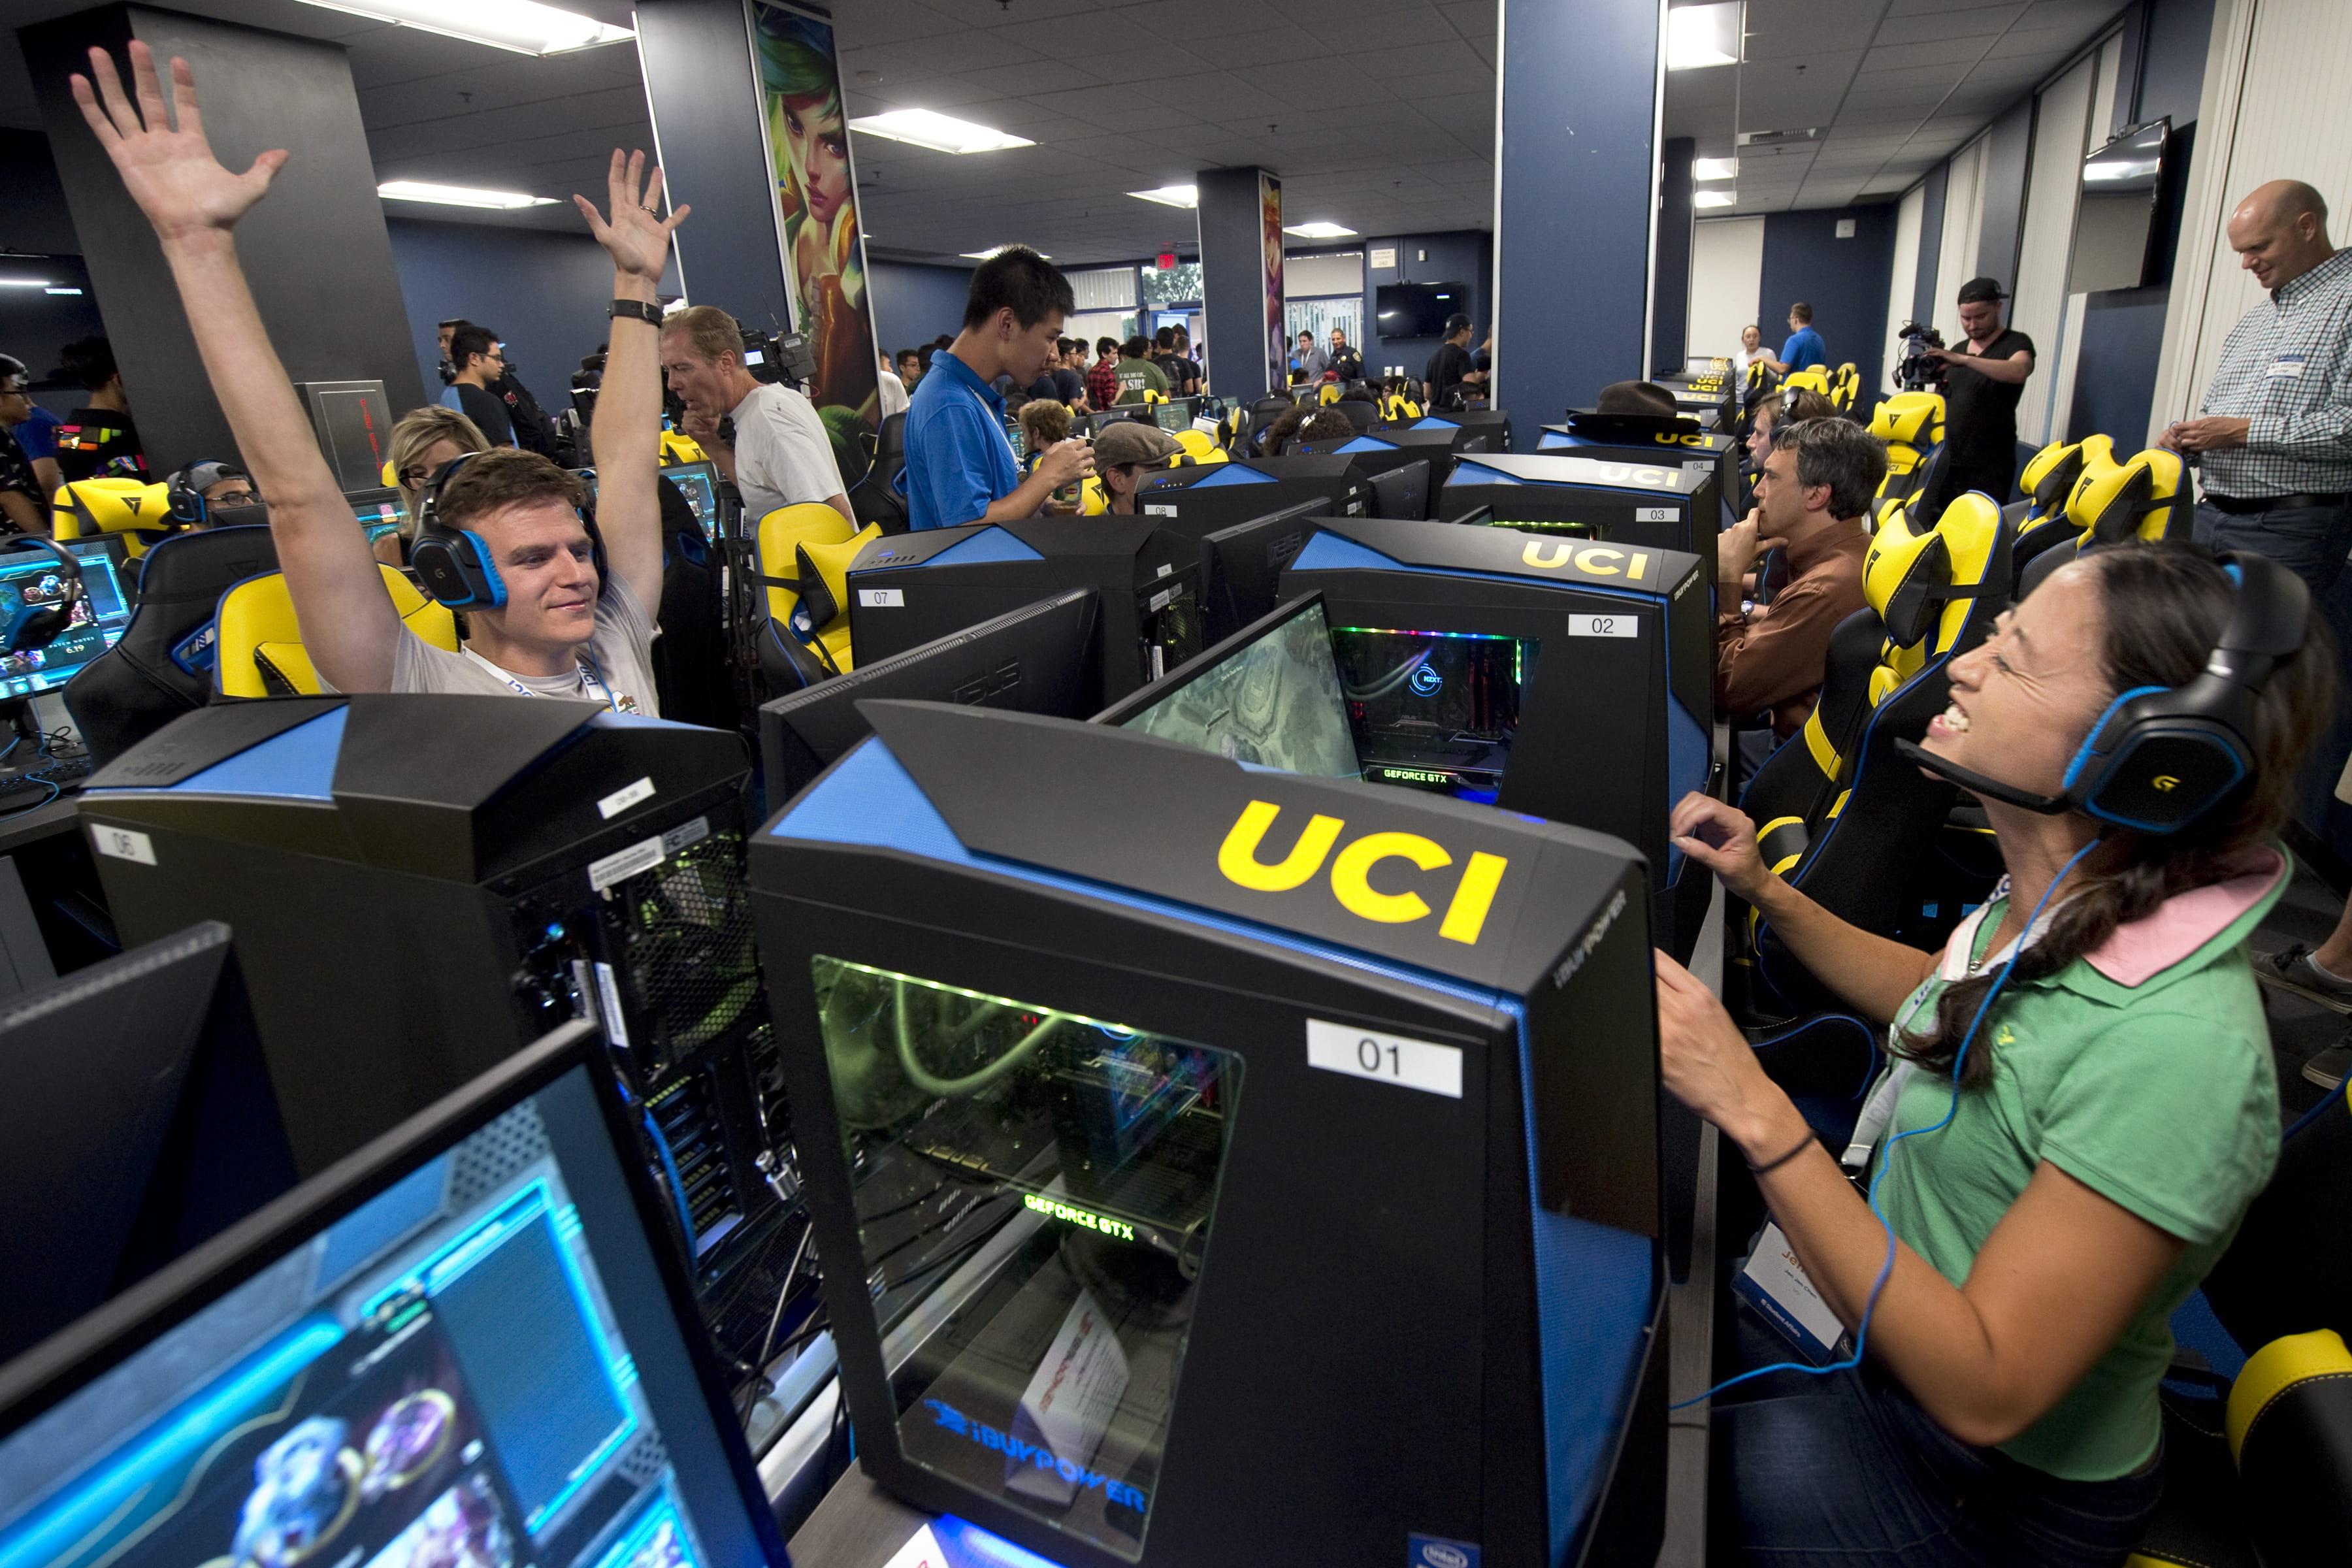 UCI Study Spots | University of California, Irvine